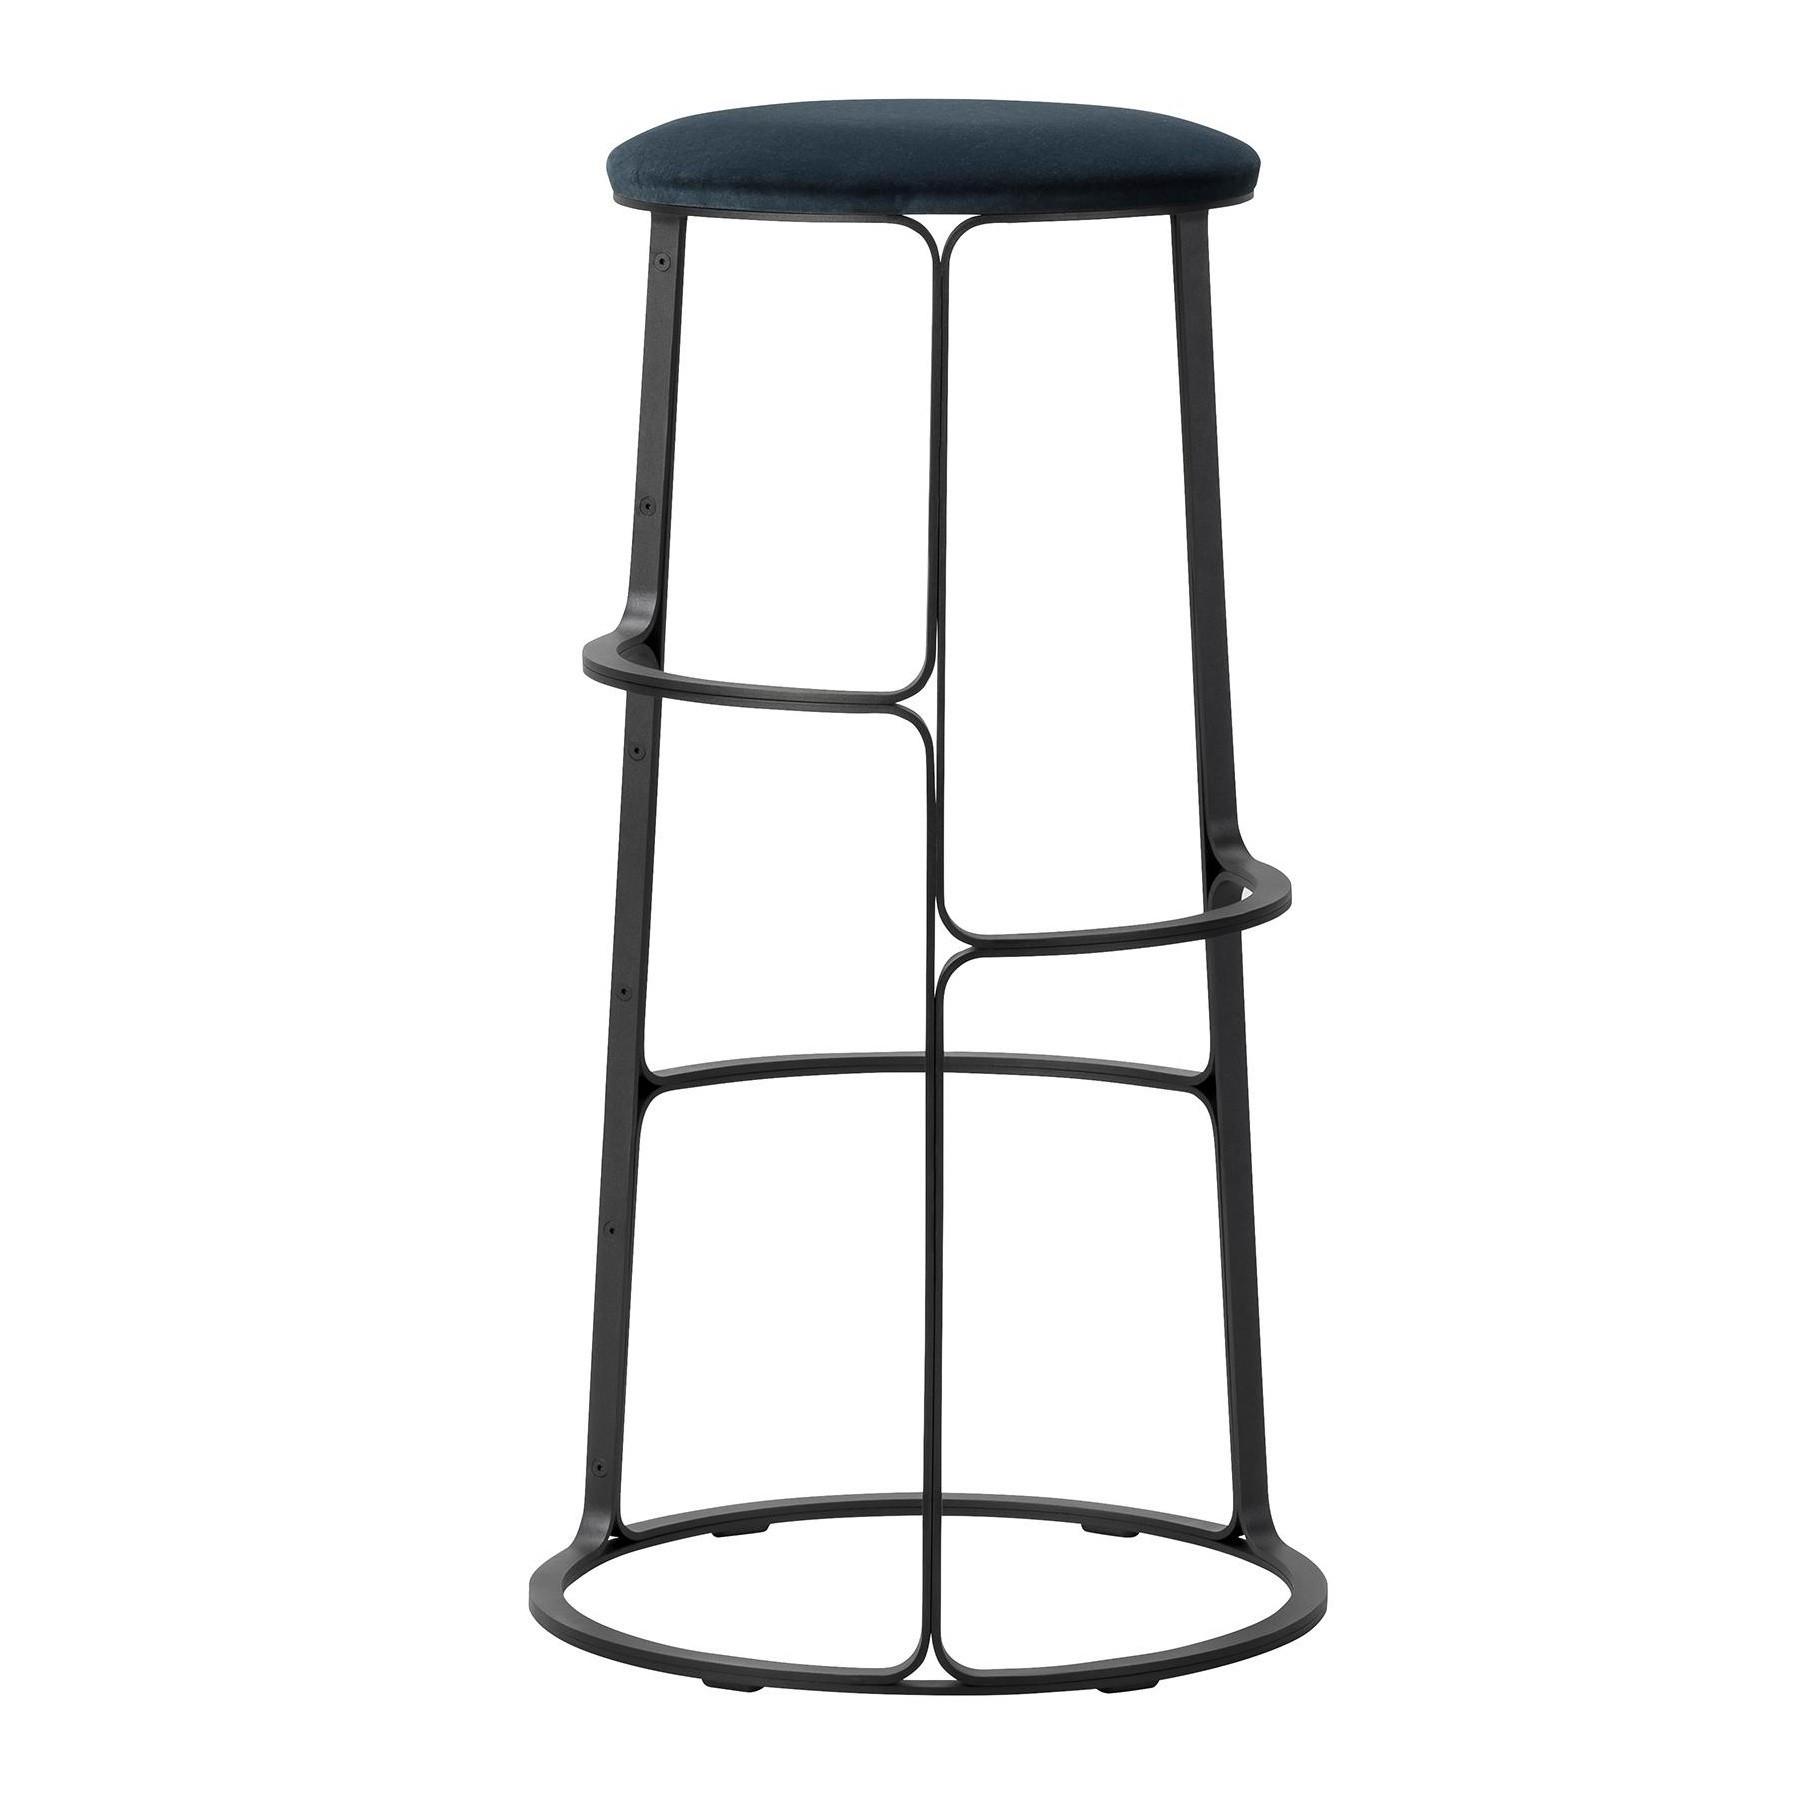 Admirable Barbry Bar Stool Upholstered Inzonedesignstudio Interior Chair Design Inzonedesignstudiocom